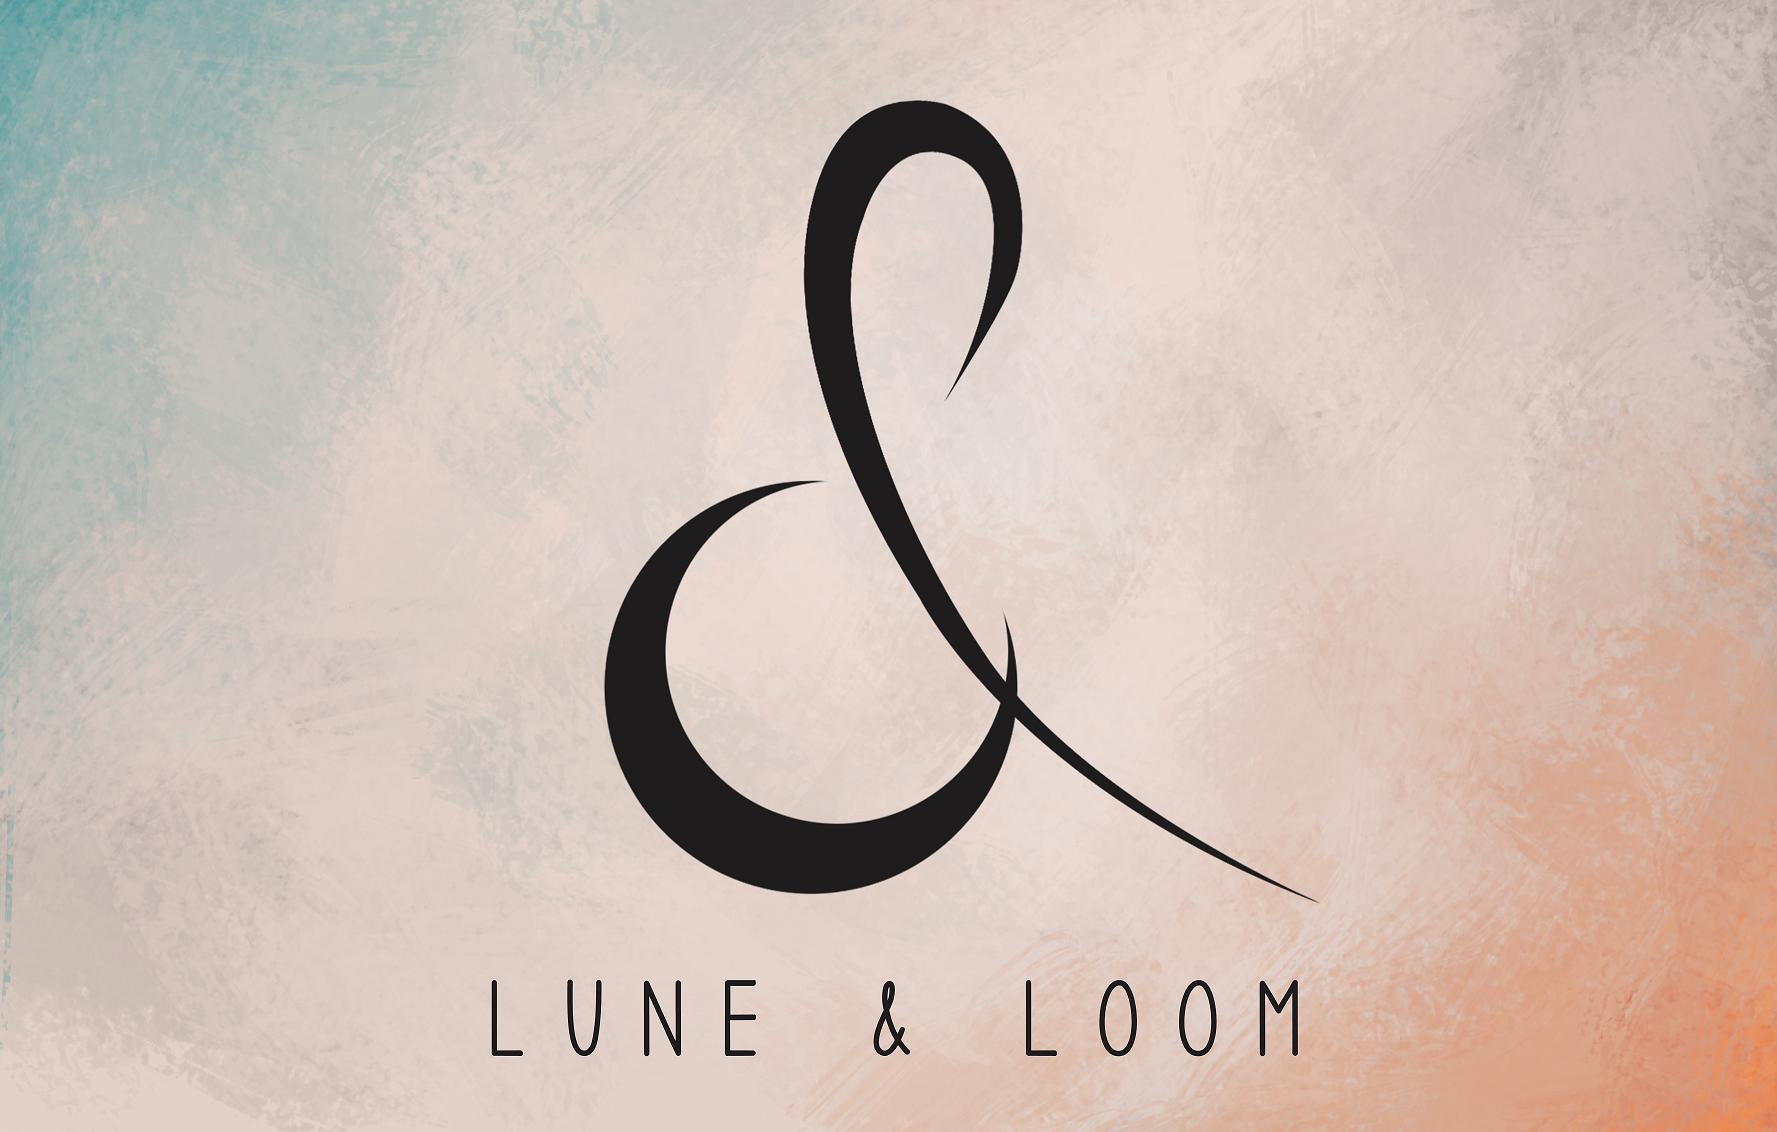 Lune & Loom